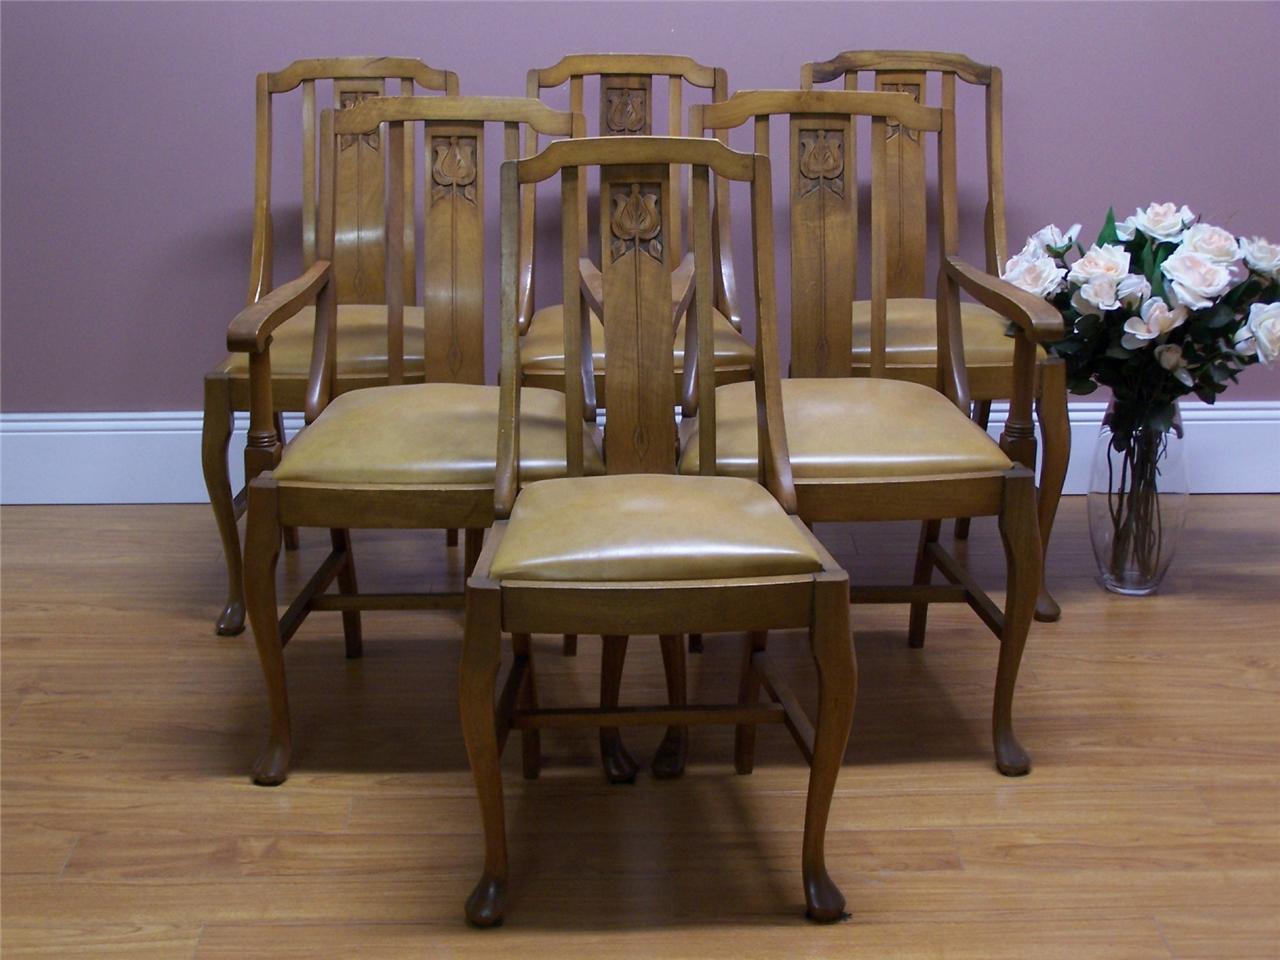 Antique Vintage Australian Maple Dining Kitchen Table  : 694594344o from www.ebay.com.au size 1280 x 960 jpeg 118kB